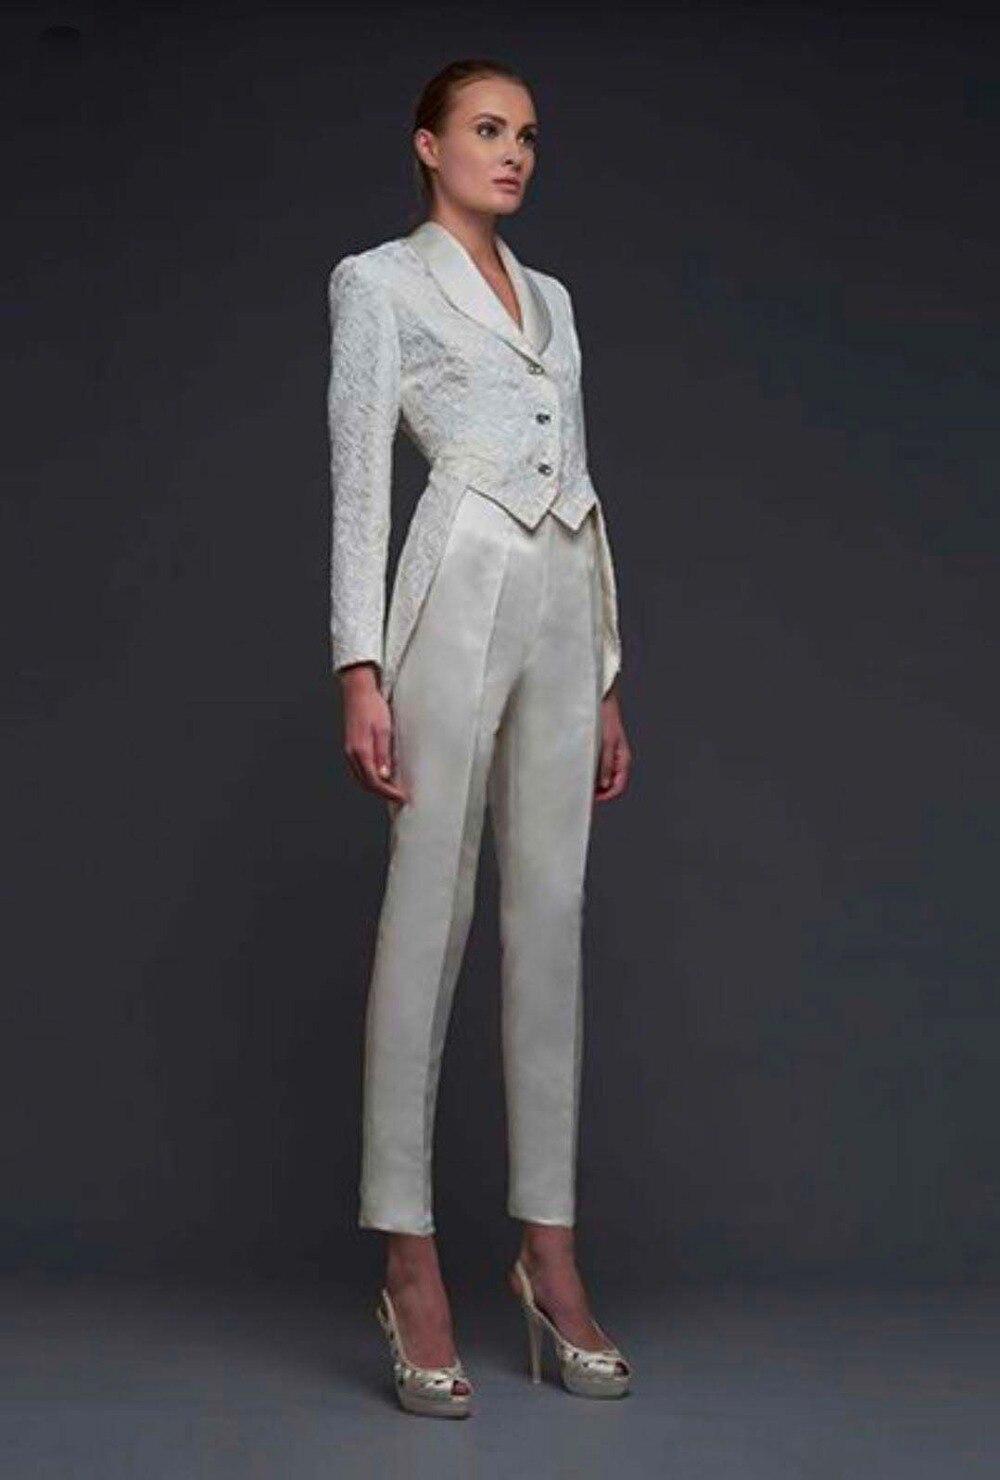 Women Pant Suits Ladies Suit Custom Made Formal Business Office Tuxedo Jacket+Pants Suits Female Office Uniform